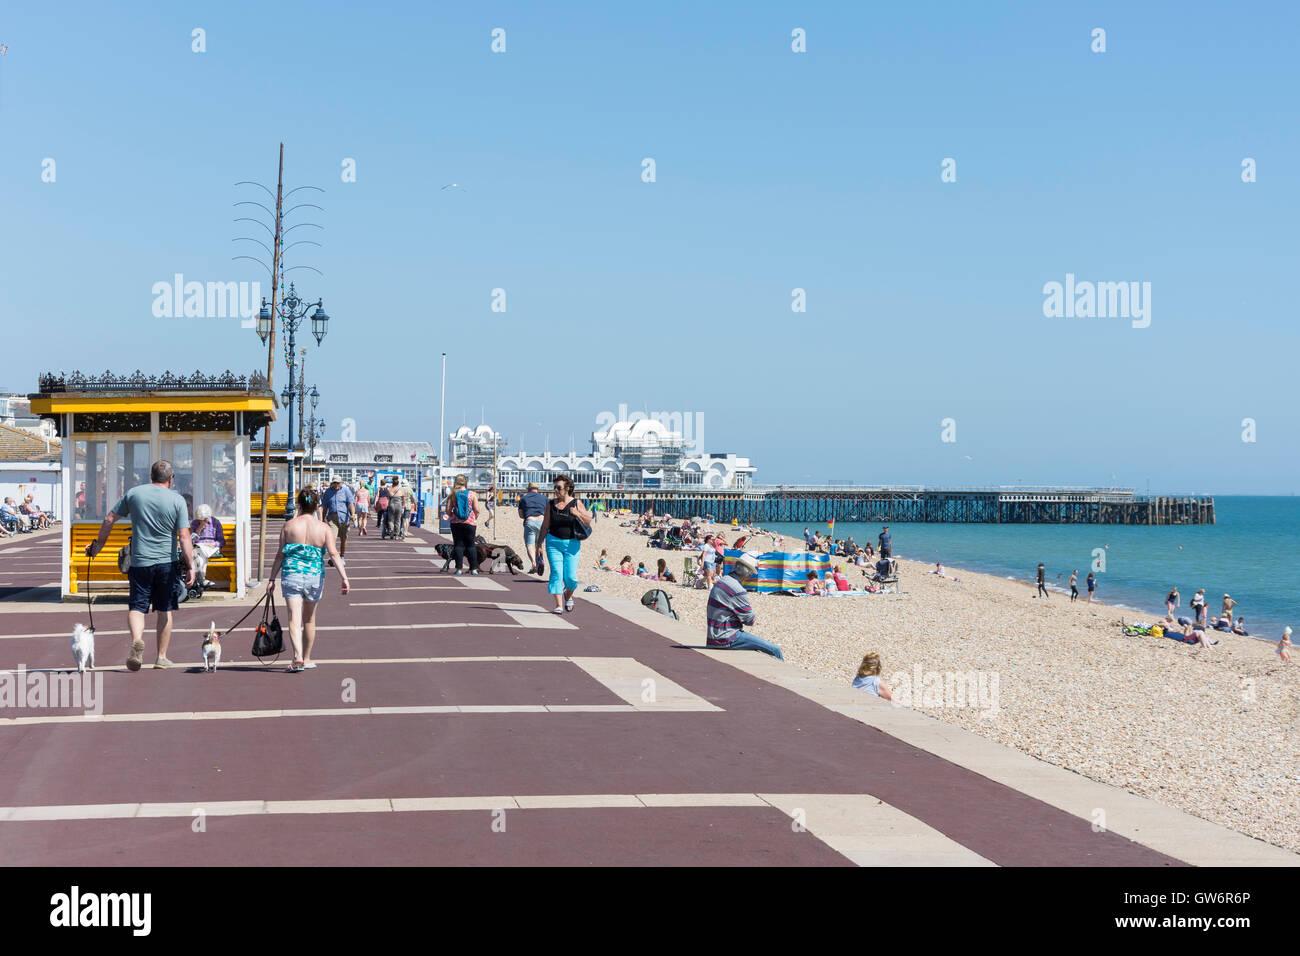 Beach promenade and South Parade Pier, Southsea Beach, Southsea, Portsmouth, Hampshire, England, United Kingdom Stock Photo